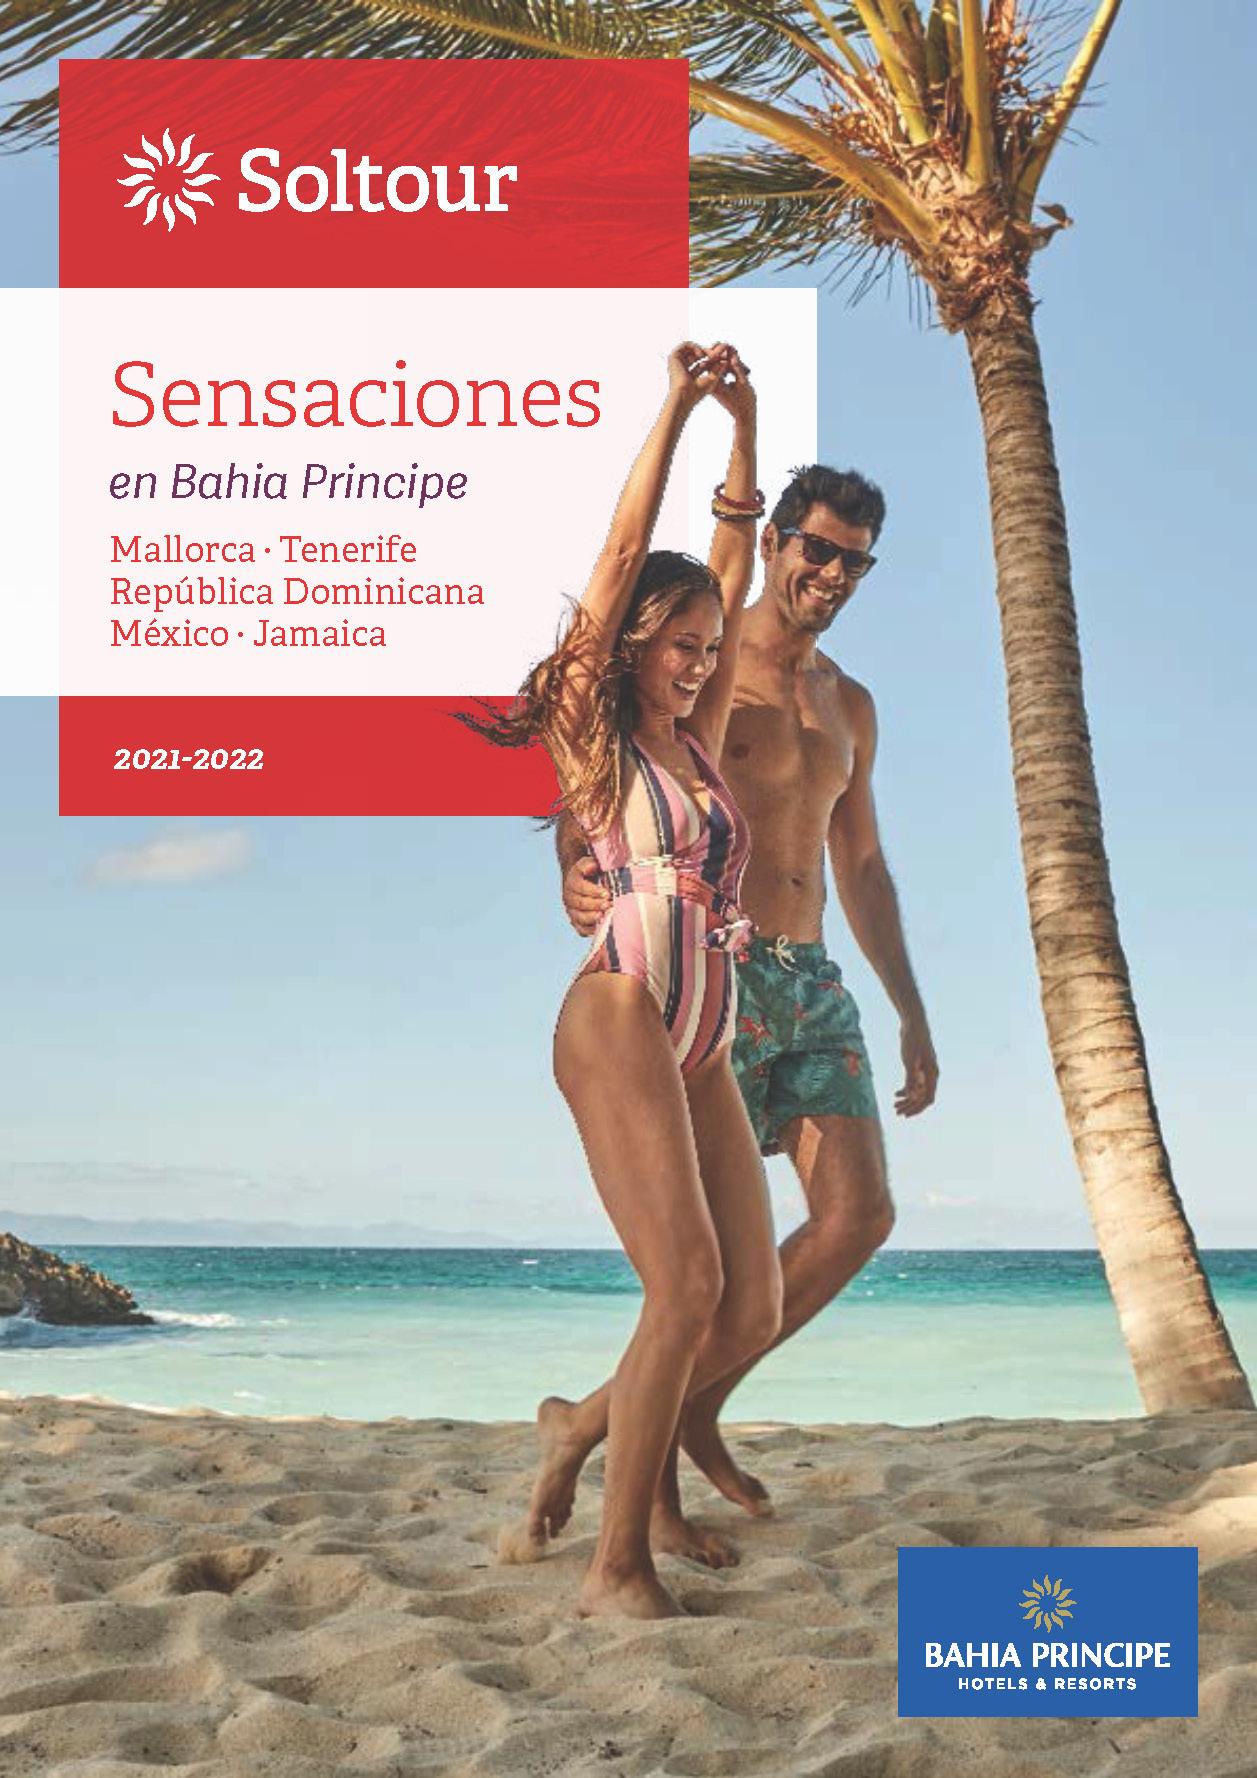 Catalogo Soltour Sensaciones Mallorca Tenerife Republica Dominicana Mexico Jamaica 2021-2022